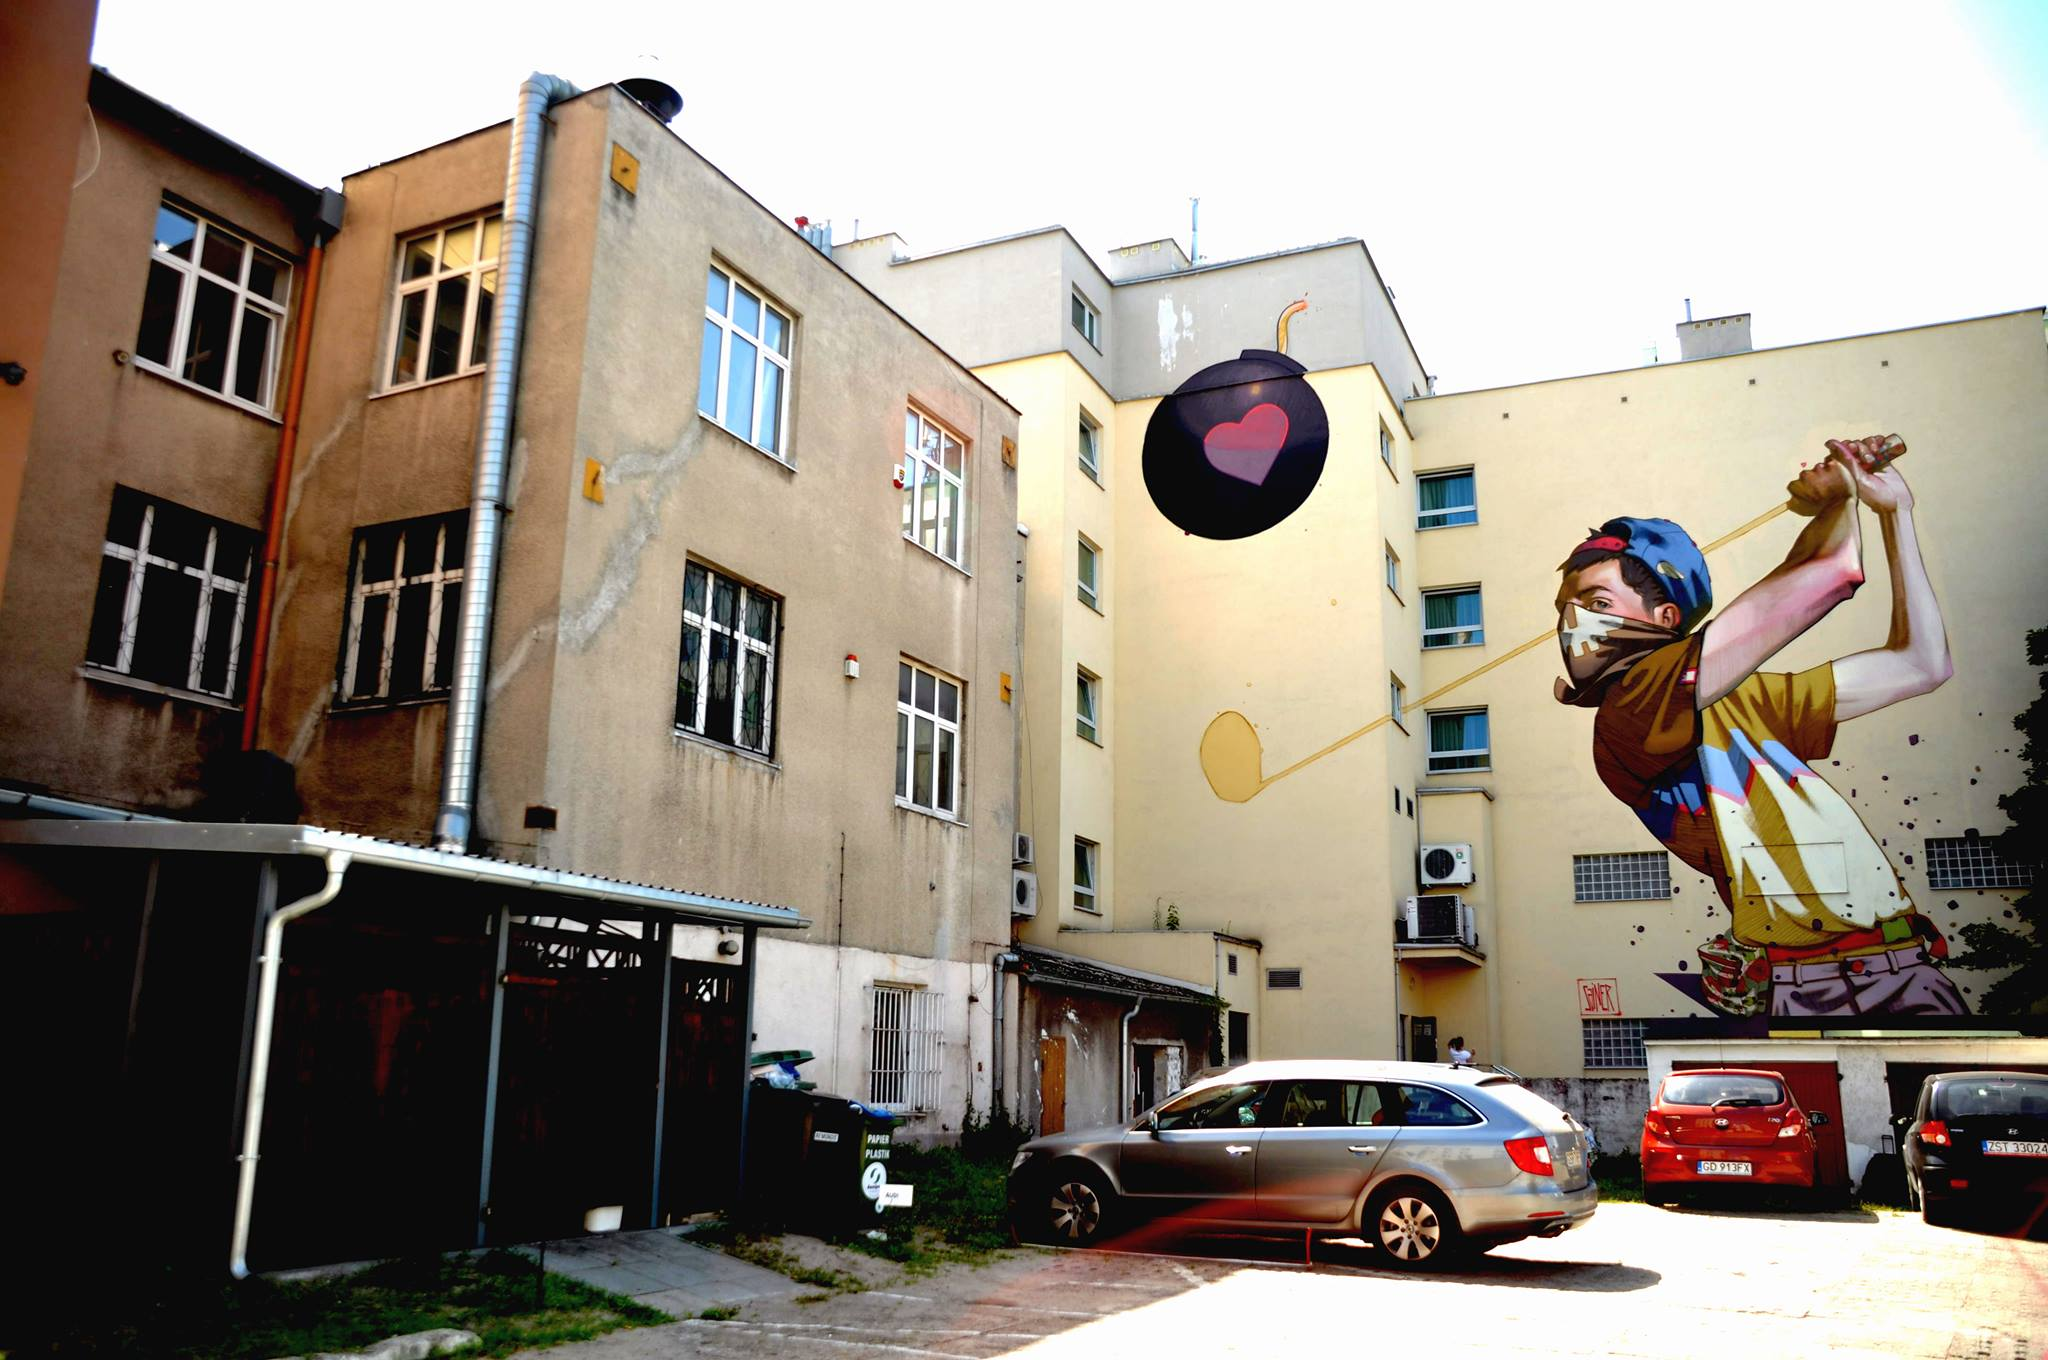 Street Art by SAINER in Gdynia, Poland